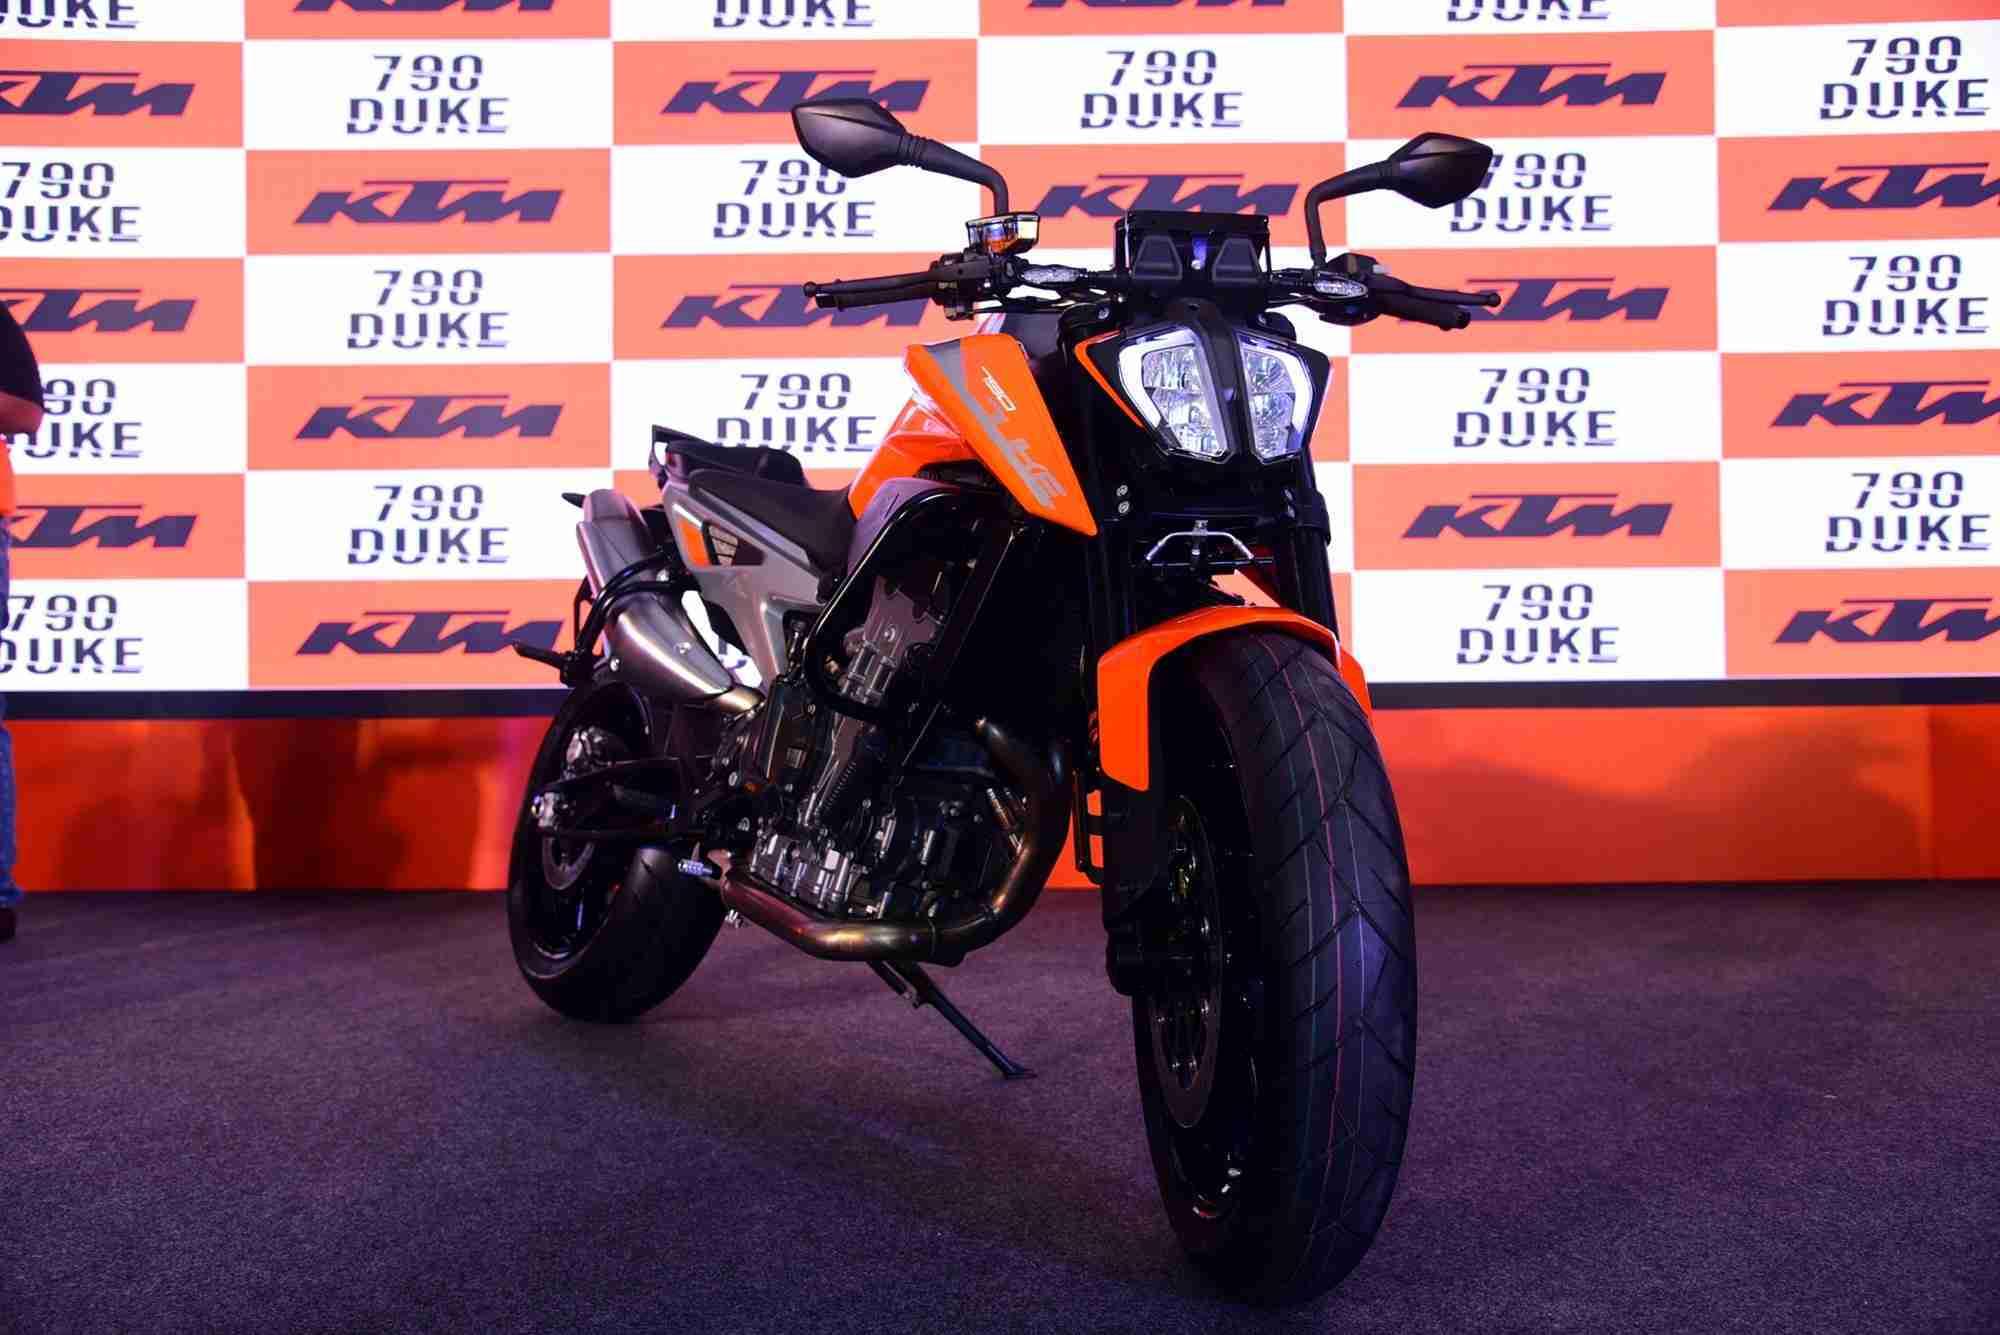 KTM Duke 790 India